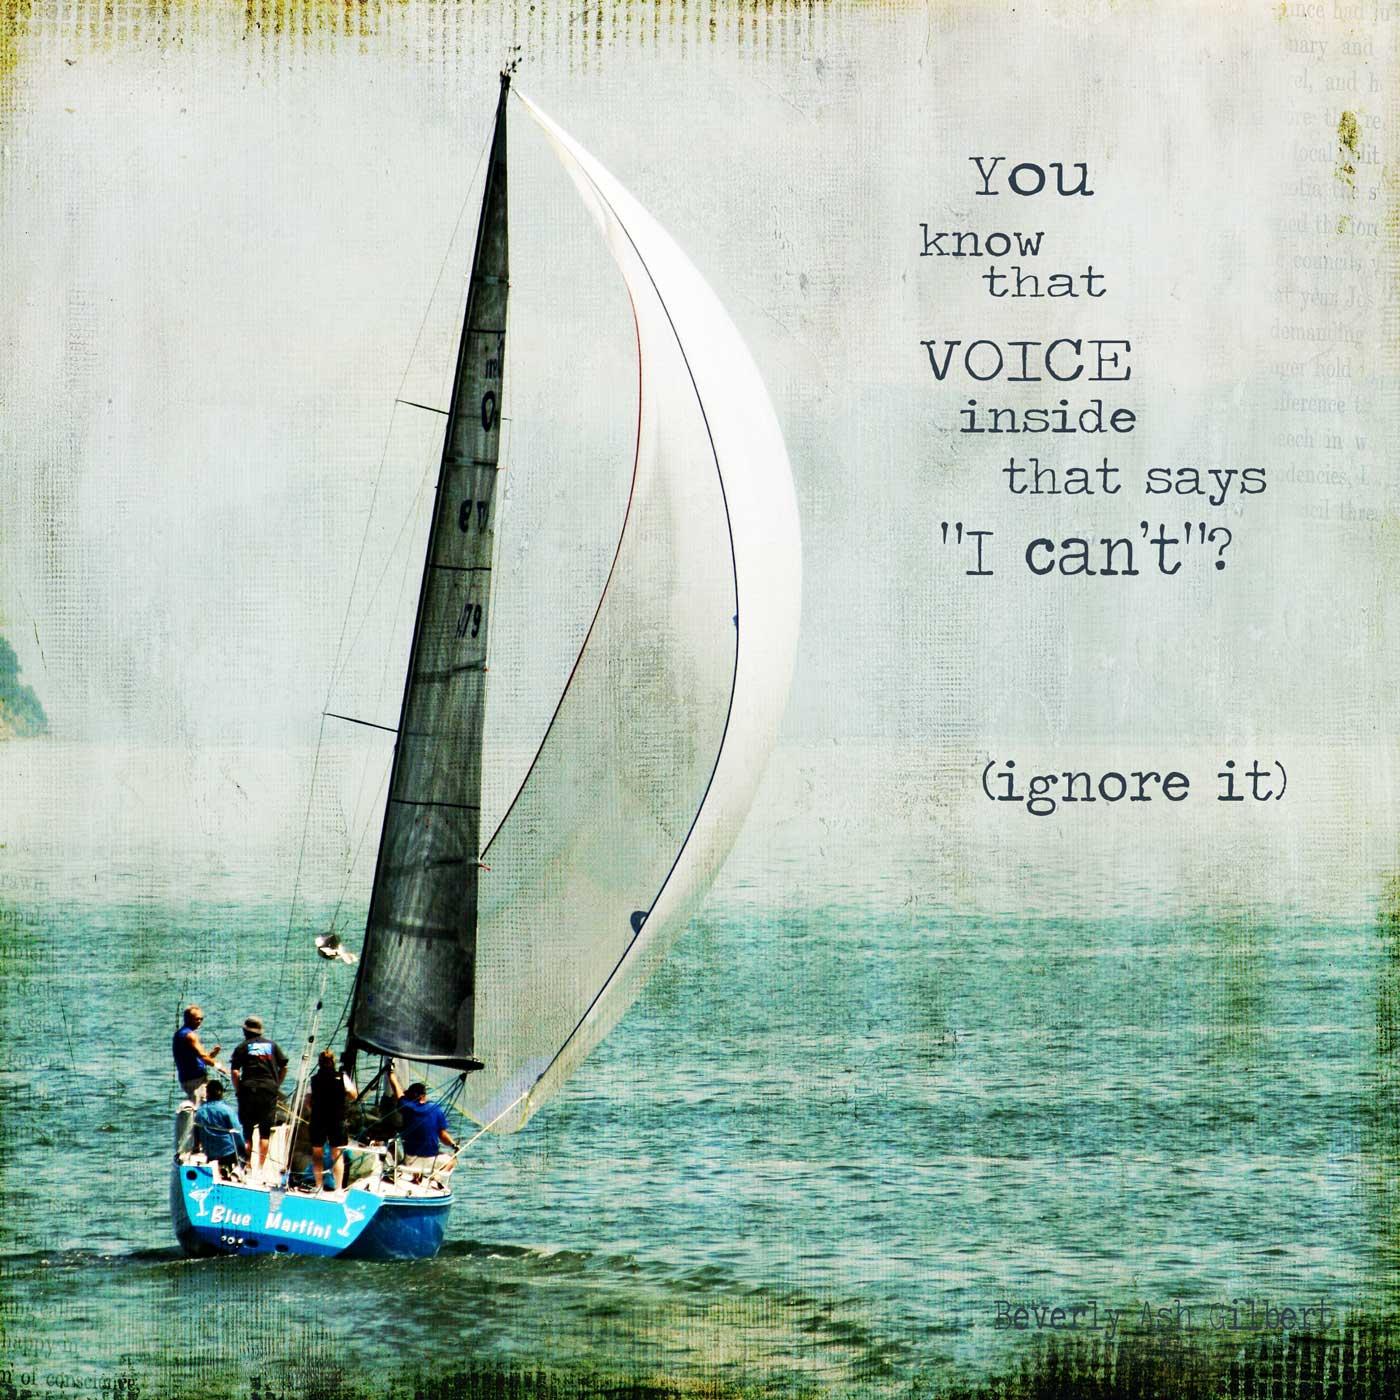 Positive_Inspiration_IgnoreVoice2.jpg